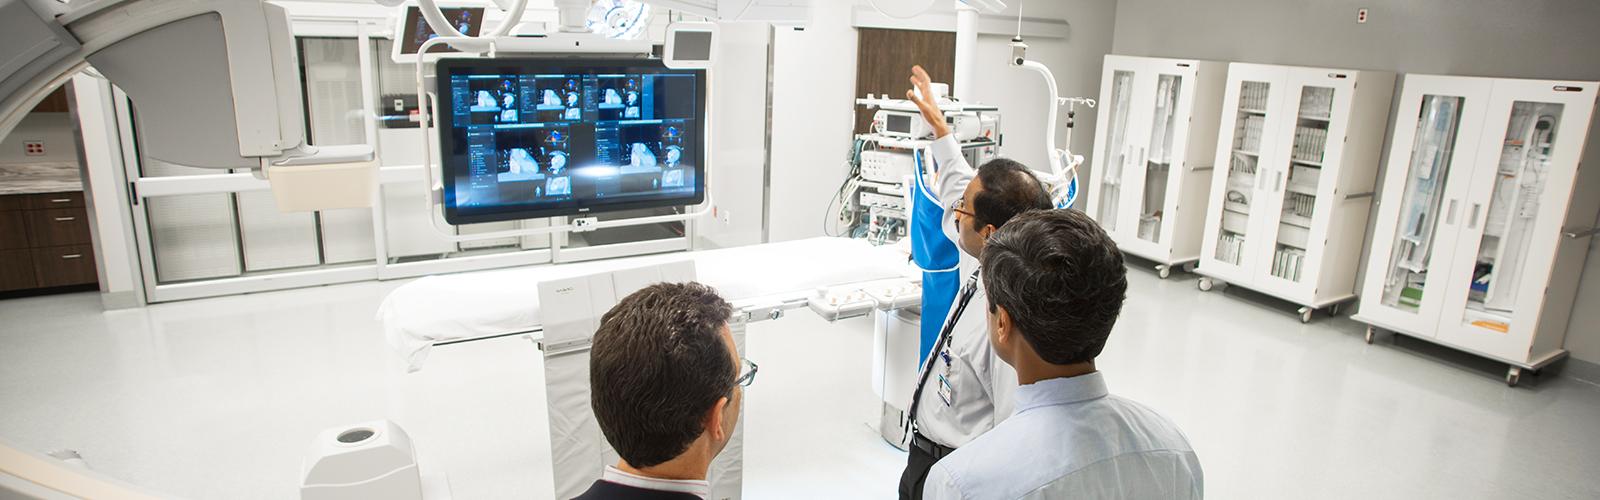 Olathe Medical Center - Hybrid EP Lab-2